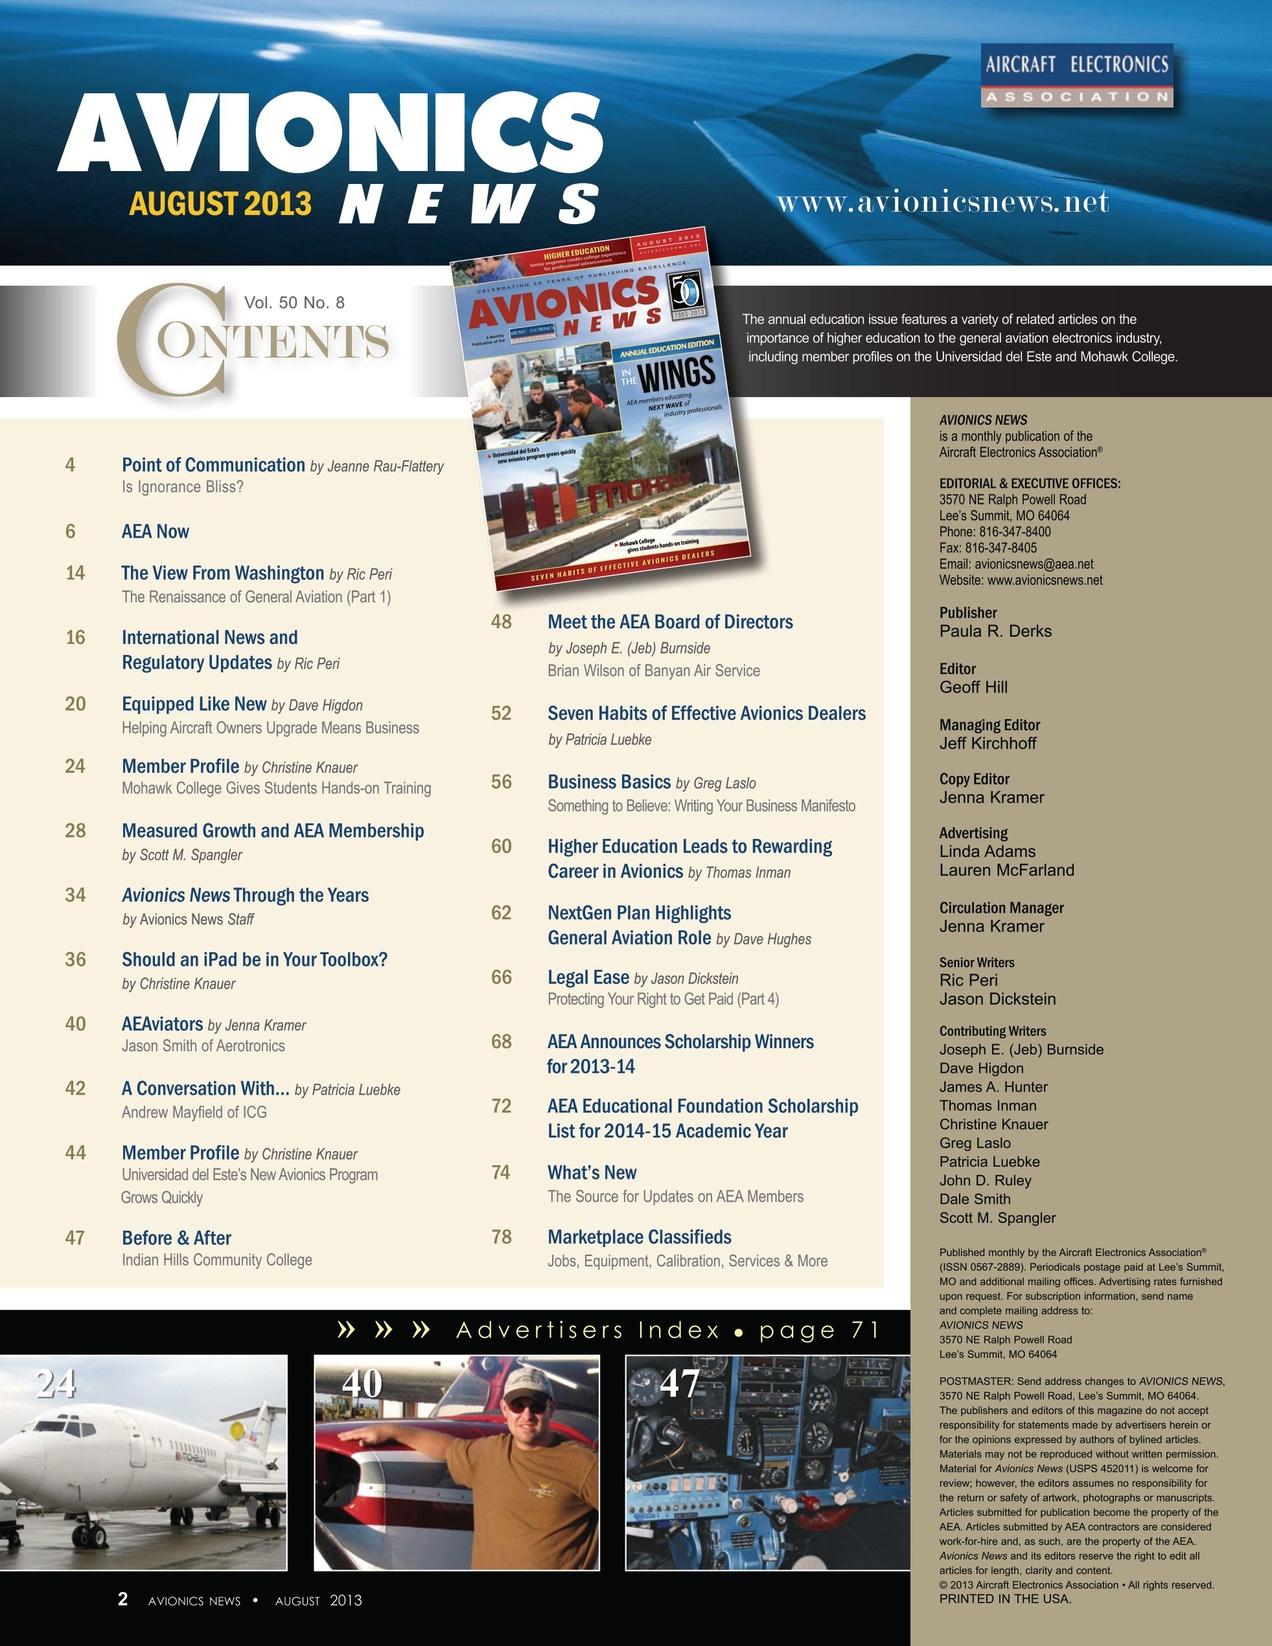 Avionics News August 2013